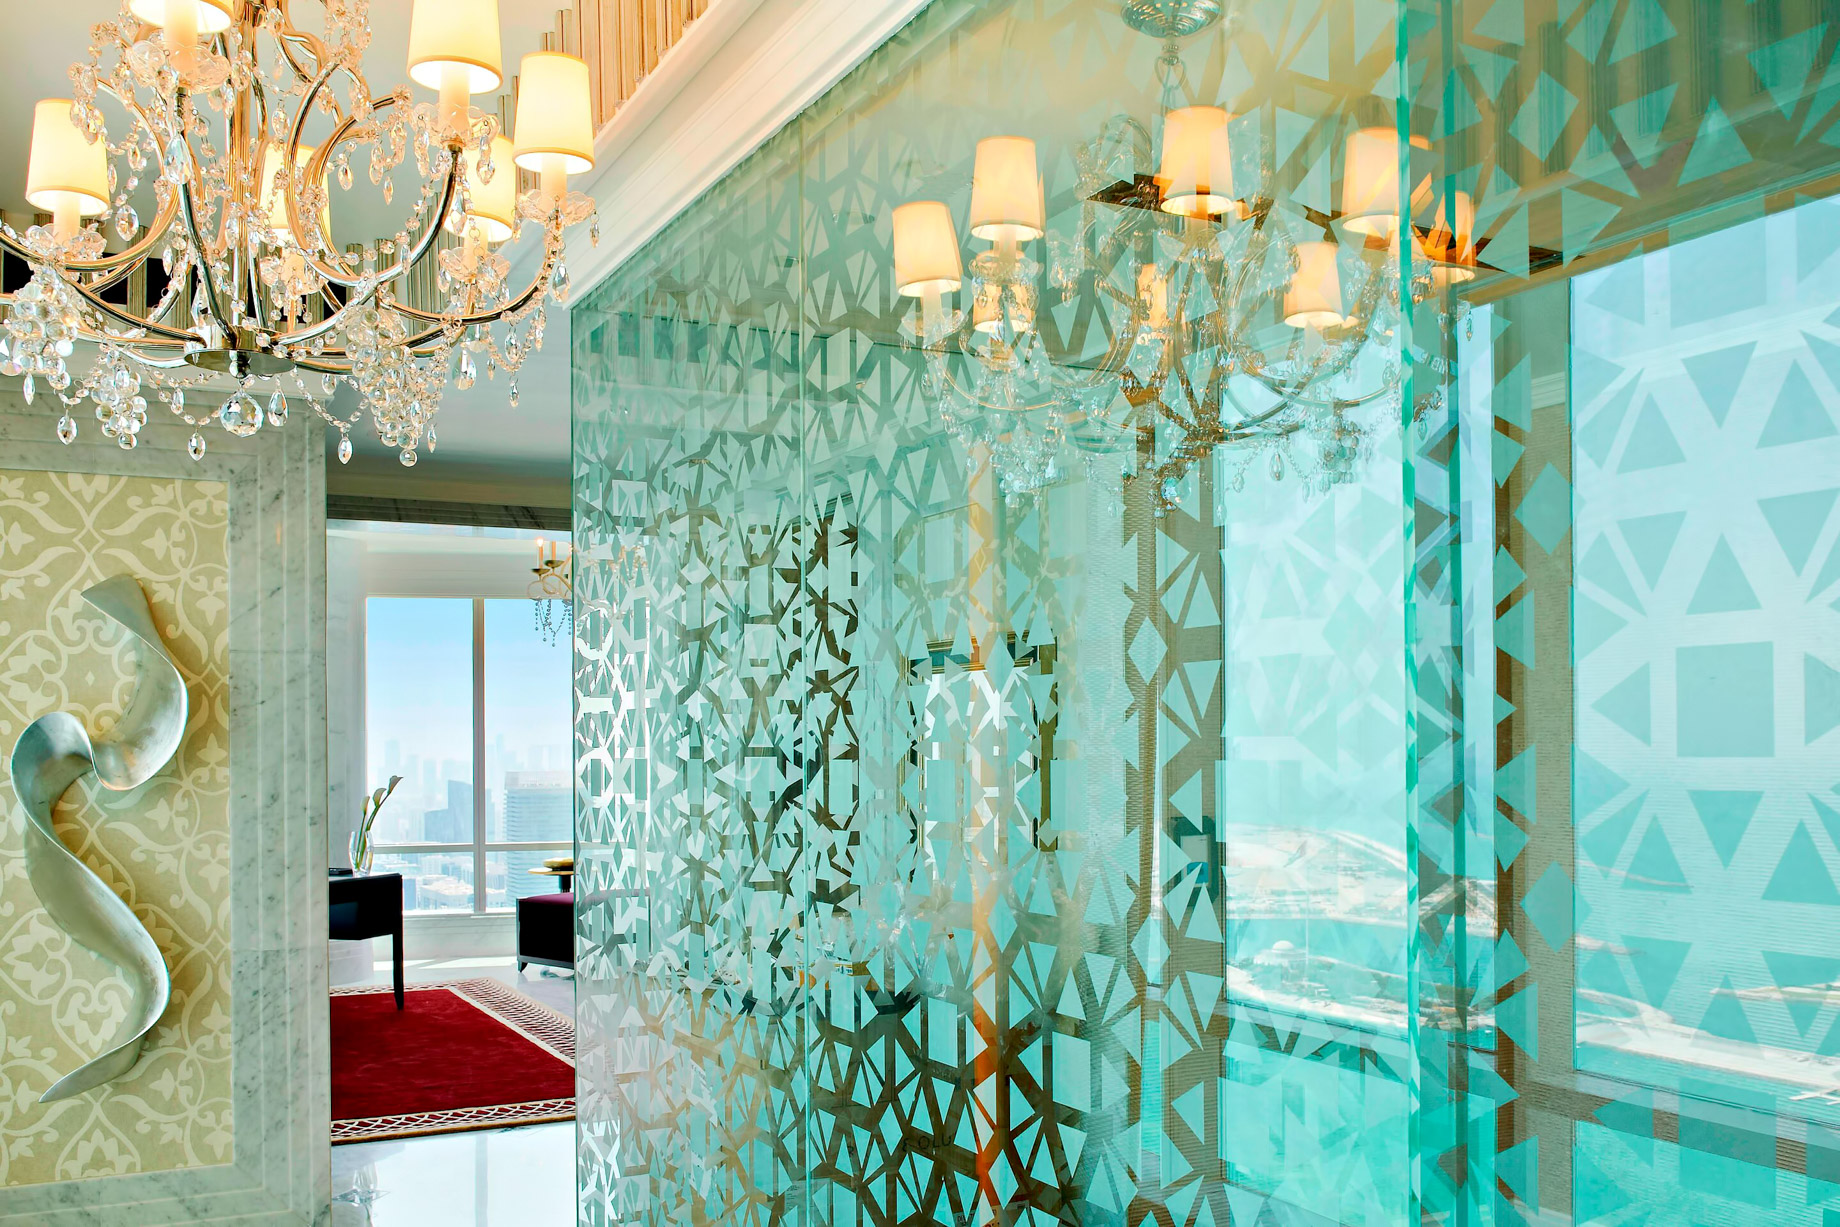 The St. Regis Abu Dhabi Luxury Hotel – Abu Dhabi, United Arab Emirates – Abu Dhabi Suite Private Exercise Room